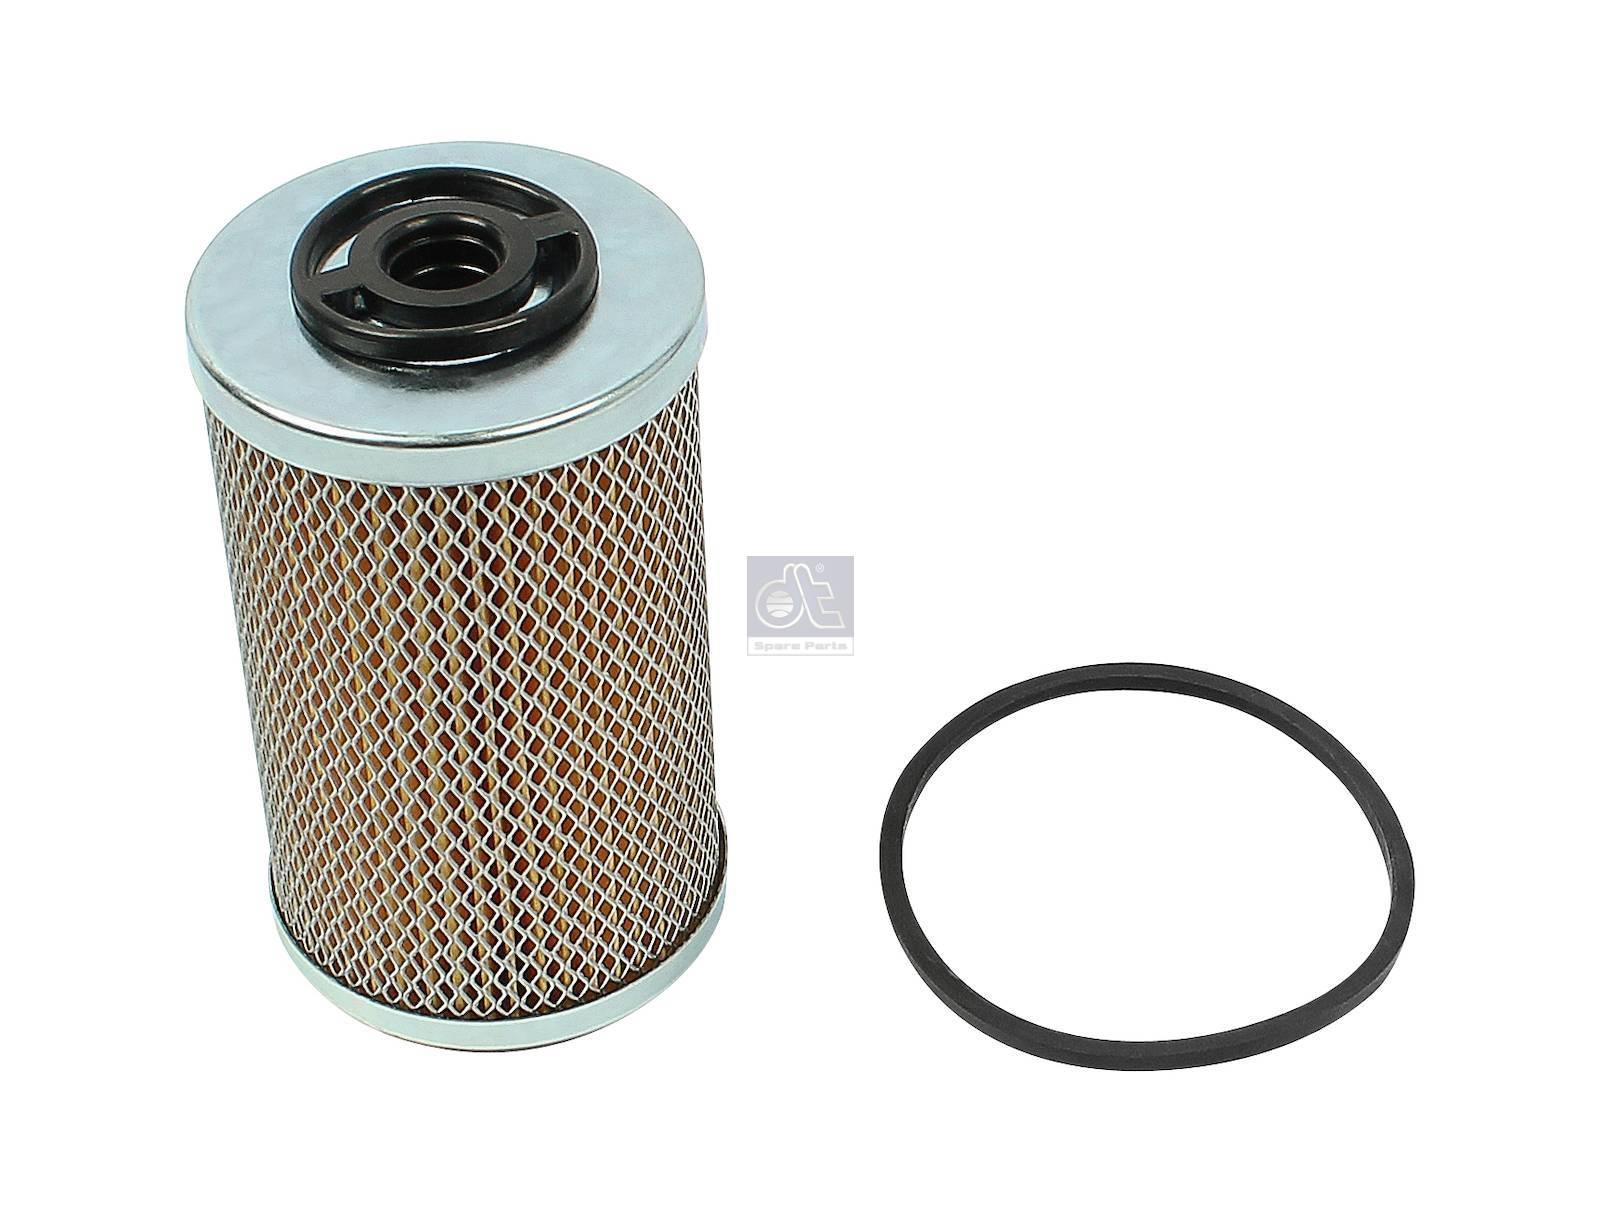 Diesel Technic Products Deutz Fuel Filters Filter Insert